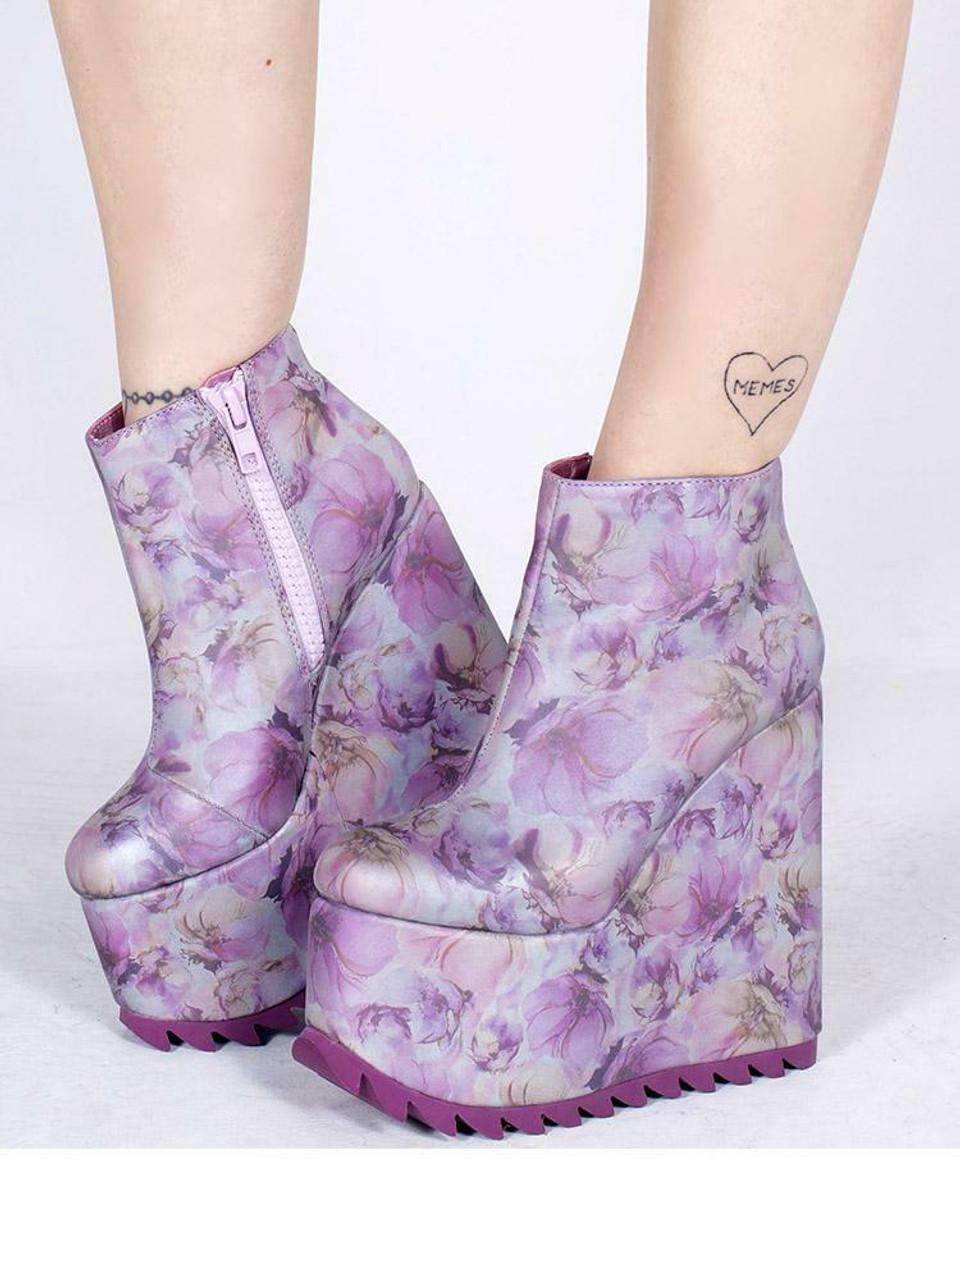 654304219f5c YRU Dimension Reflective Lavender Floral Flowers Goth Rave Platforms Shoes  Heels - Fearless Apparel